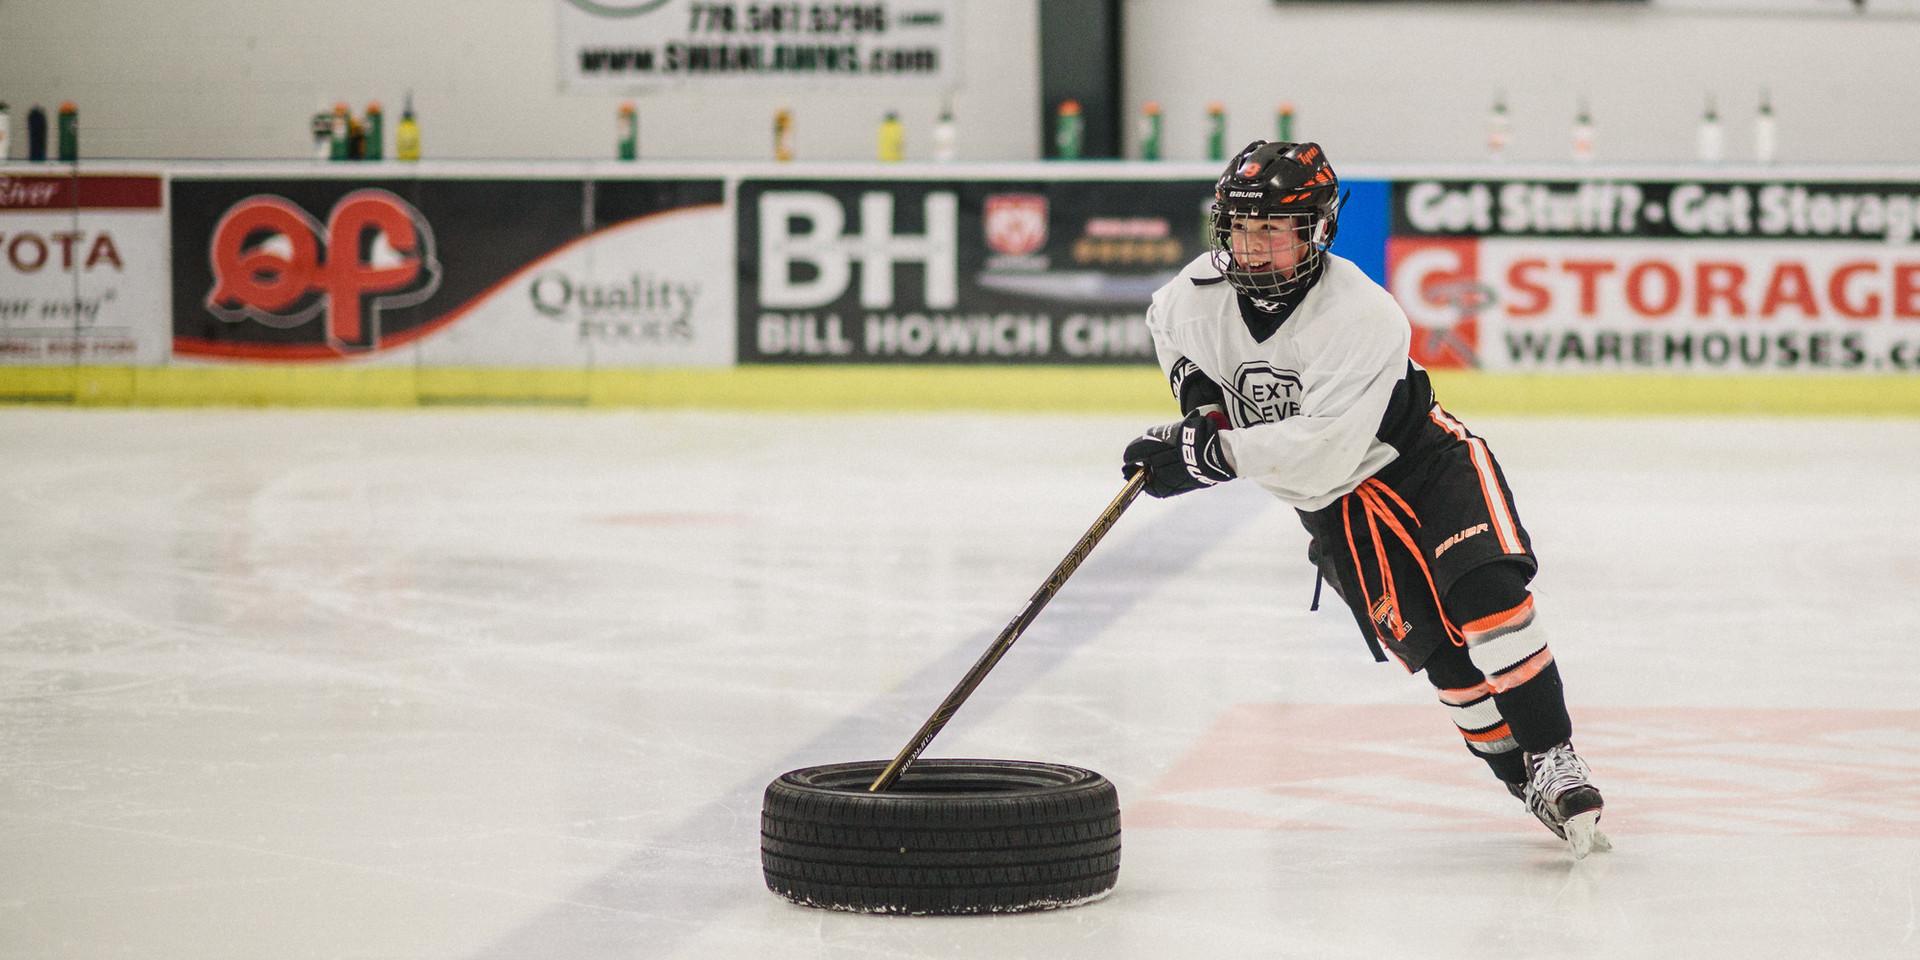 vancouver island hockey skills